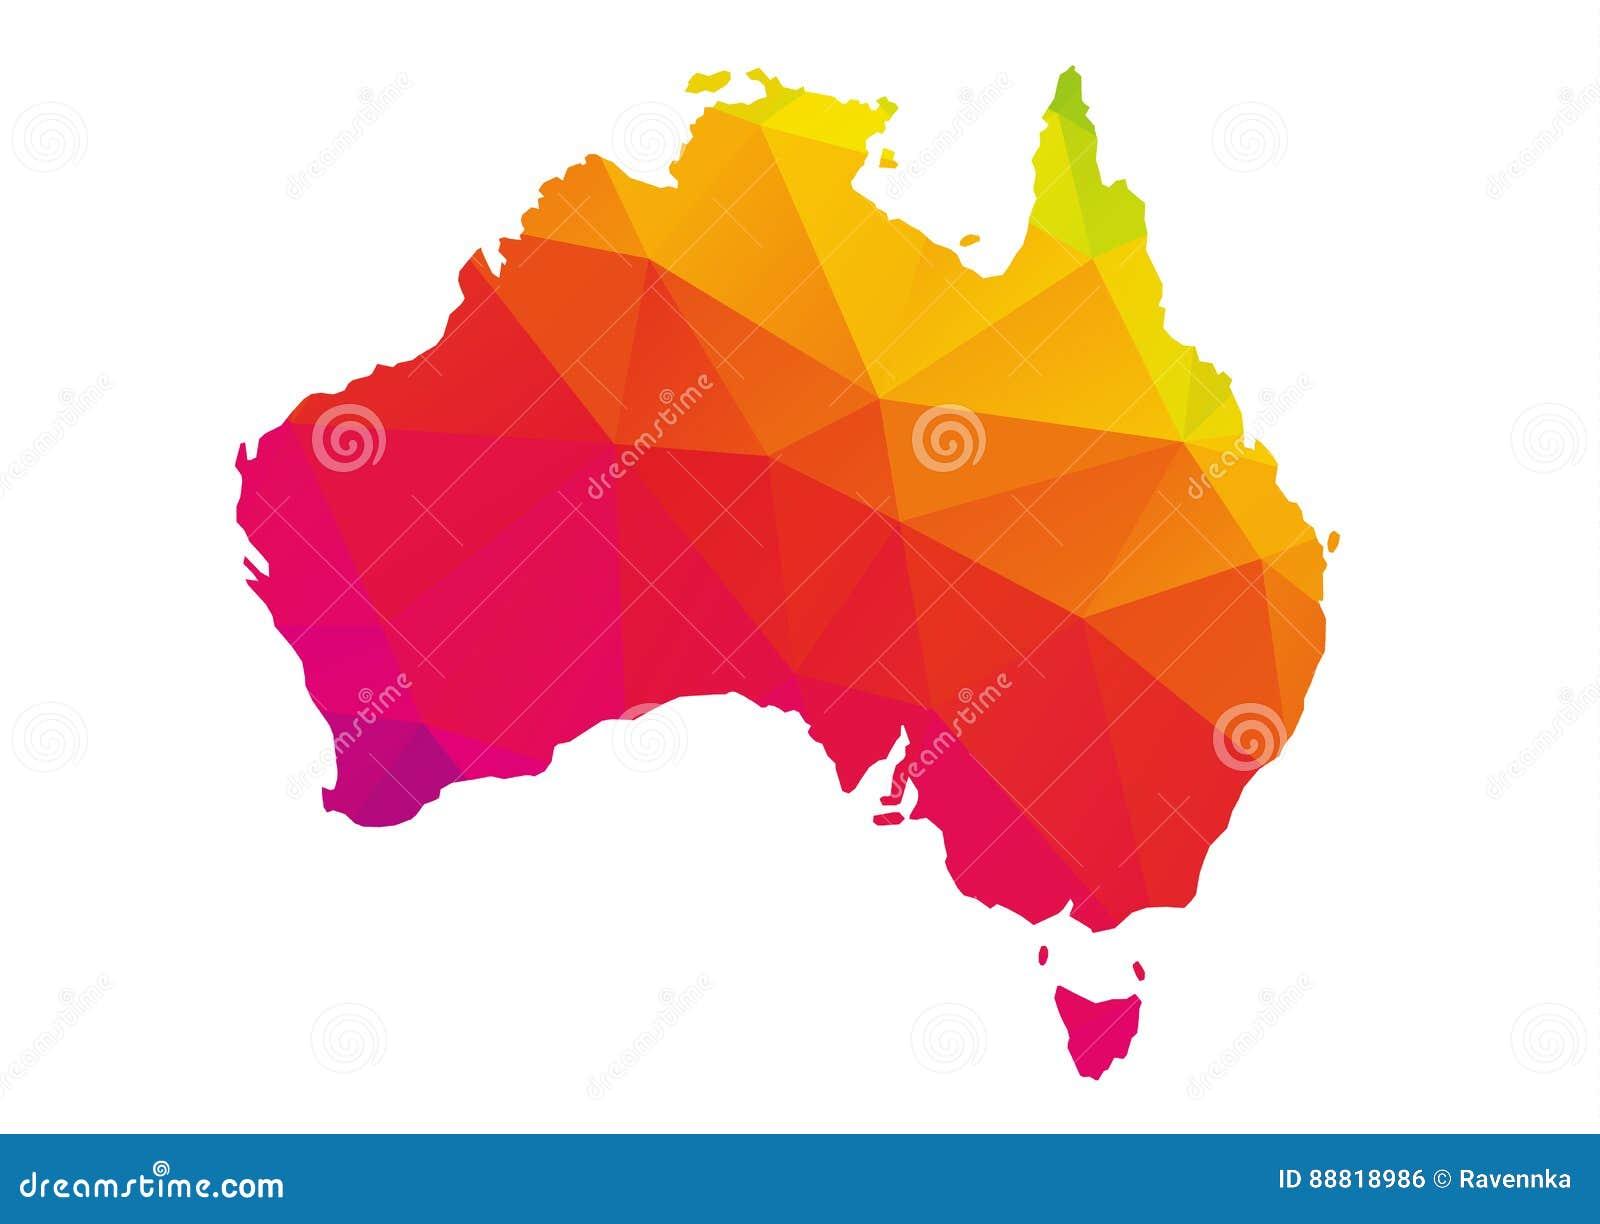 Mapa poligonal colorido de Austrália, isolado no branco